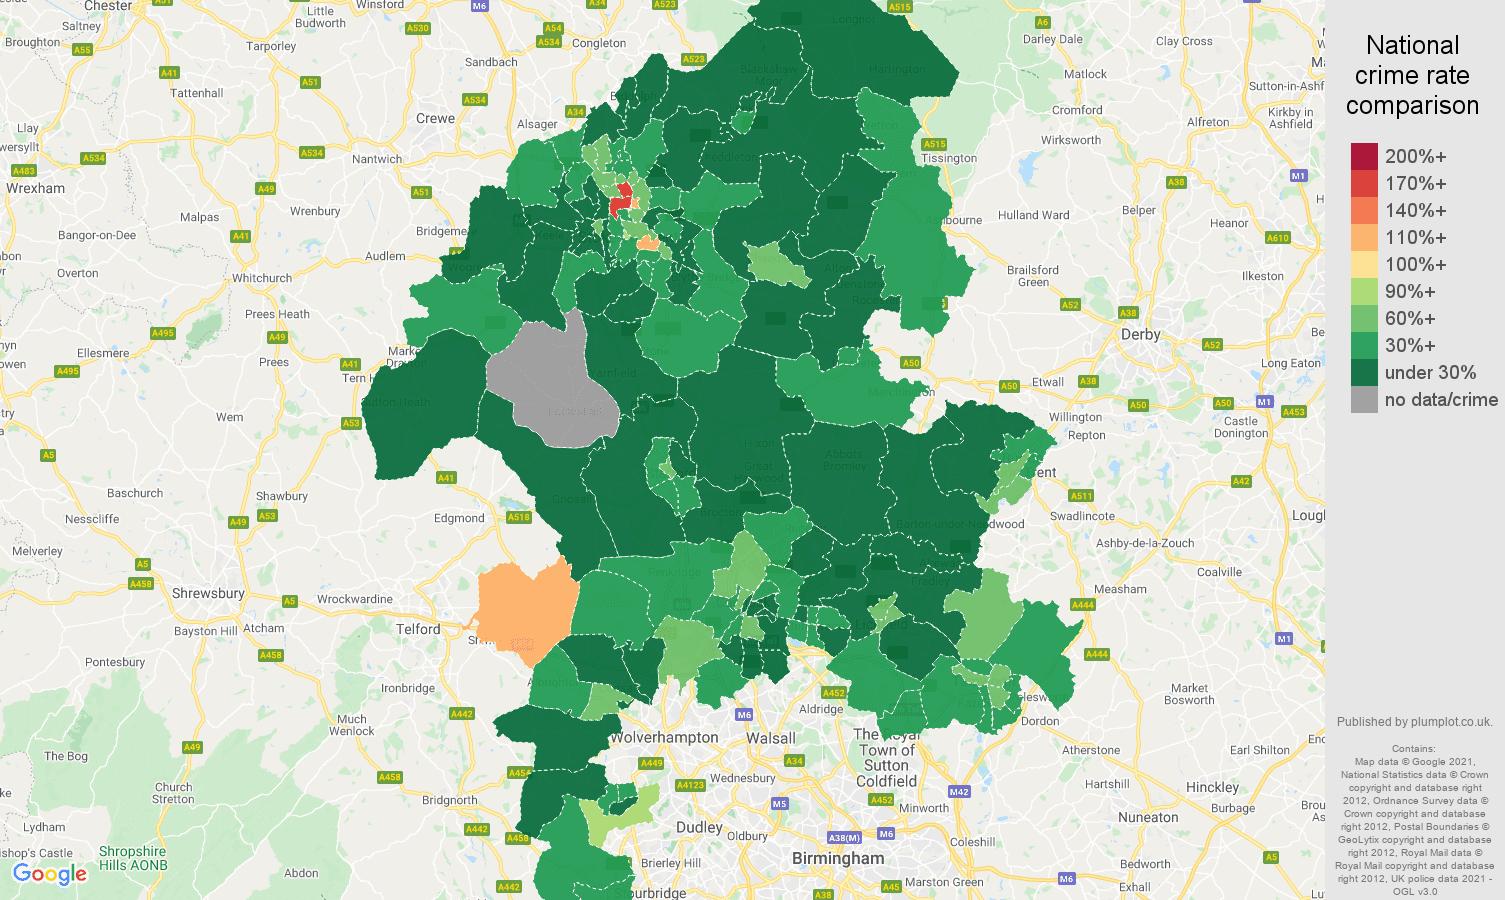 Staffordshire drugs crime rate comparison map